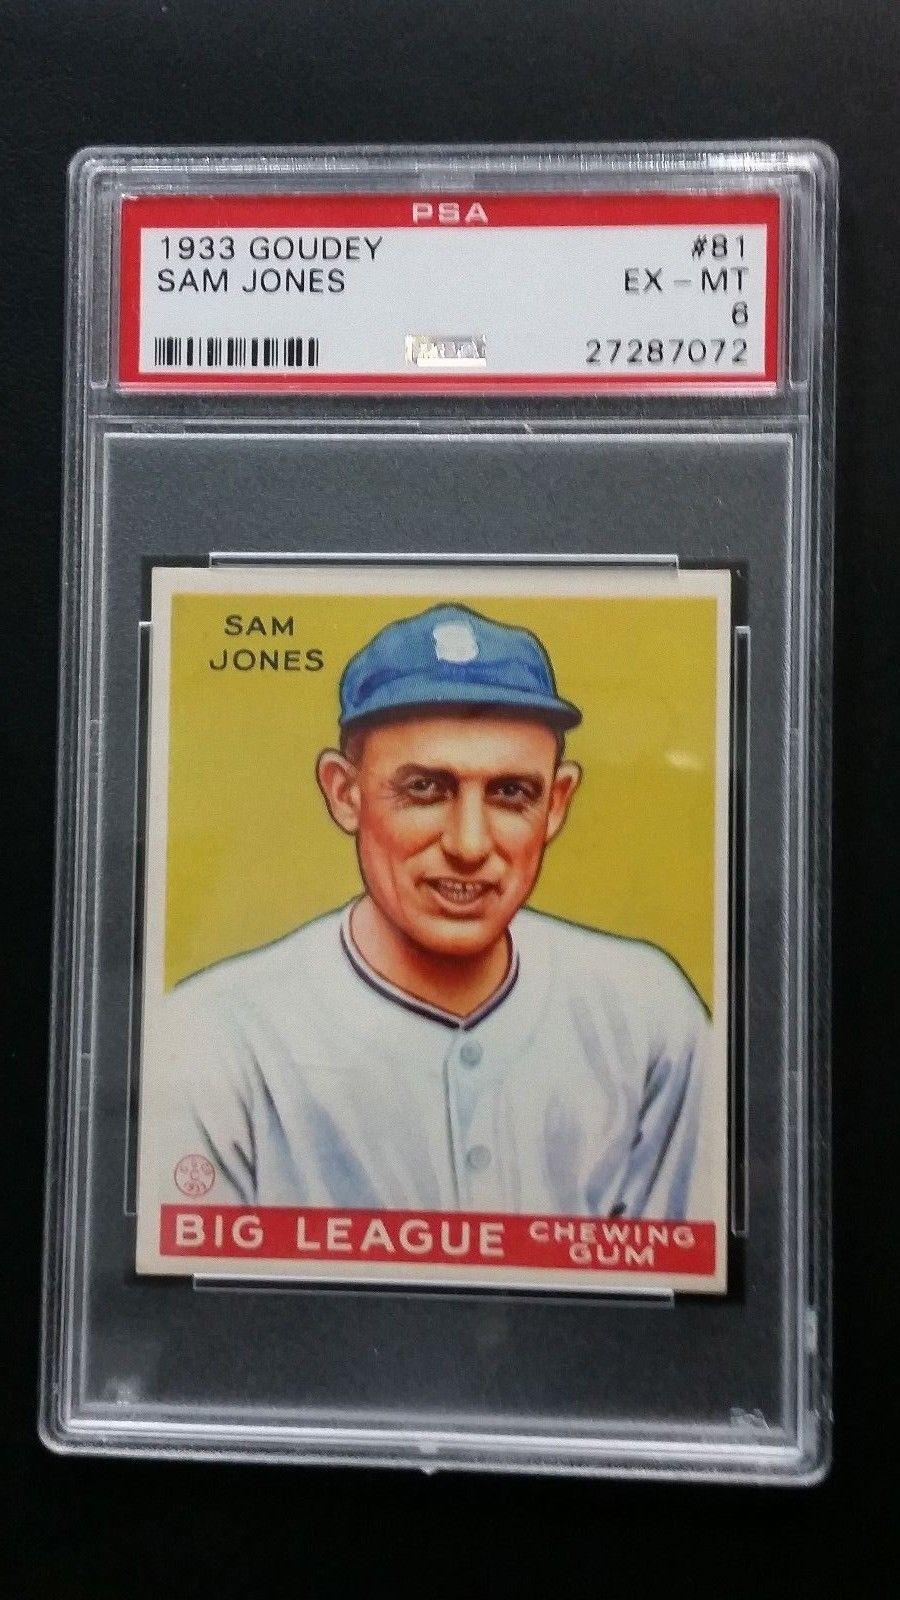 1933 Goudey 81 Sam Jones Psa Ex Mt 6 Big League Chewing